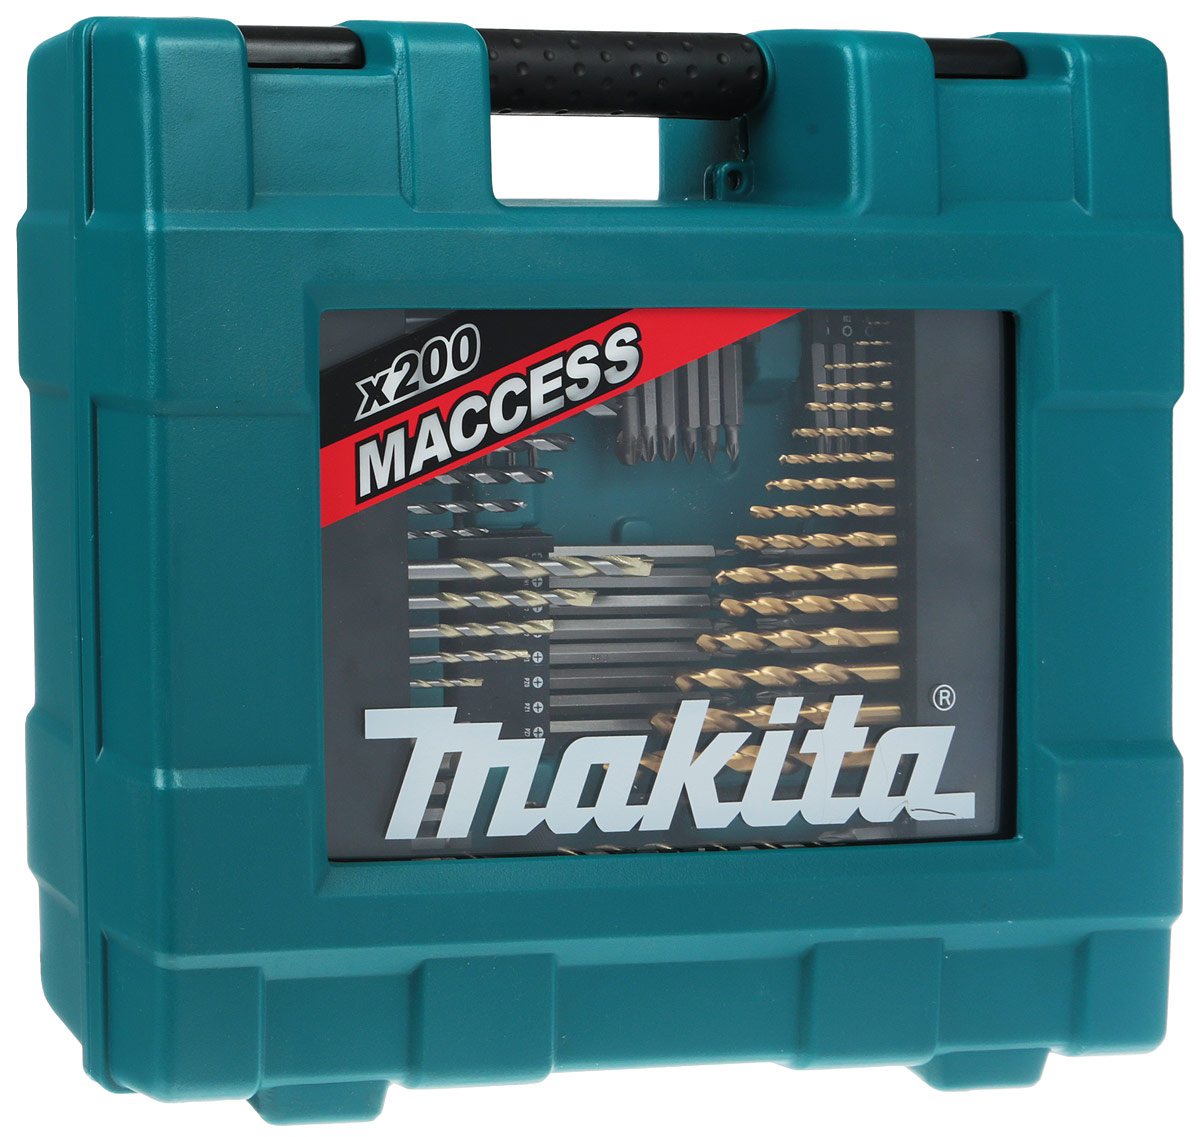 Набор оснастки Makita, 200 предметов singfire sf 914 3 led 1800lm 5 mode white diving flashlight torch black 2 x 26650